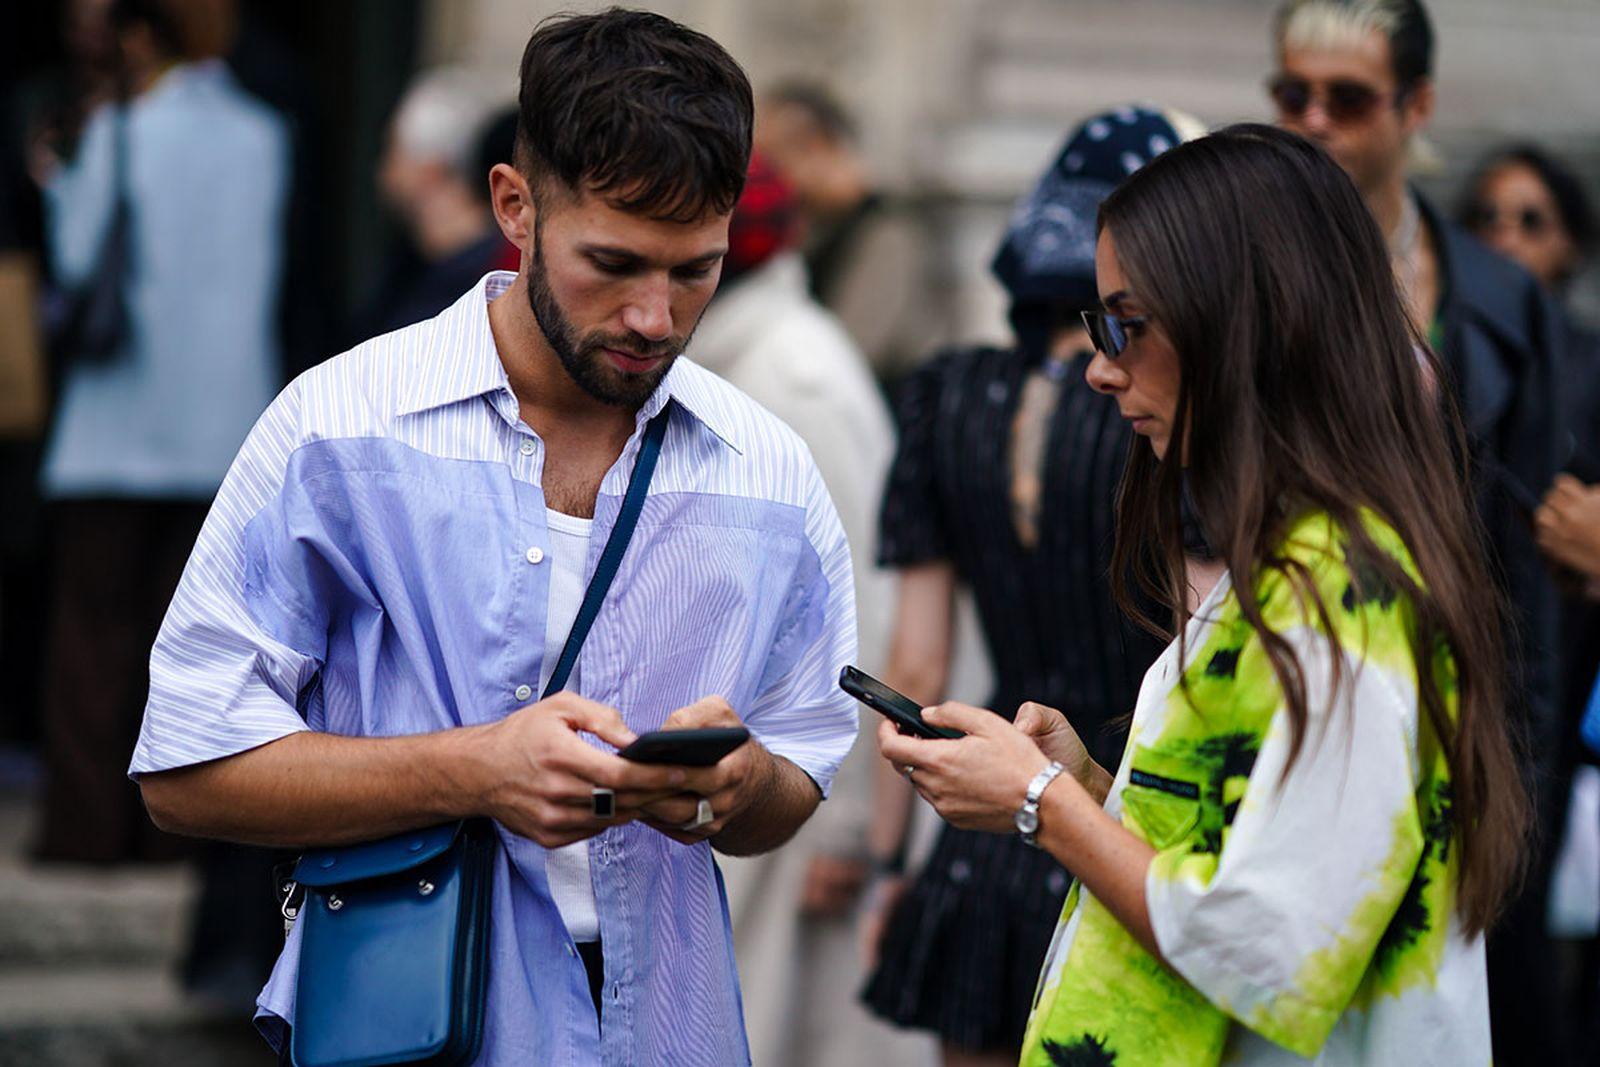 couple on their phones at Paris Fashion Week